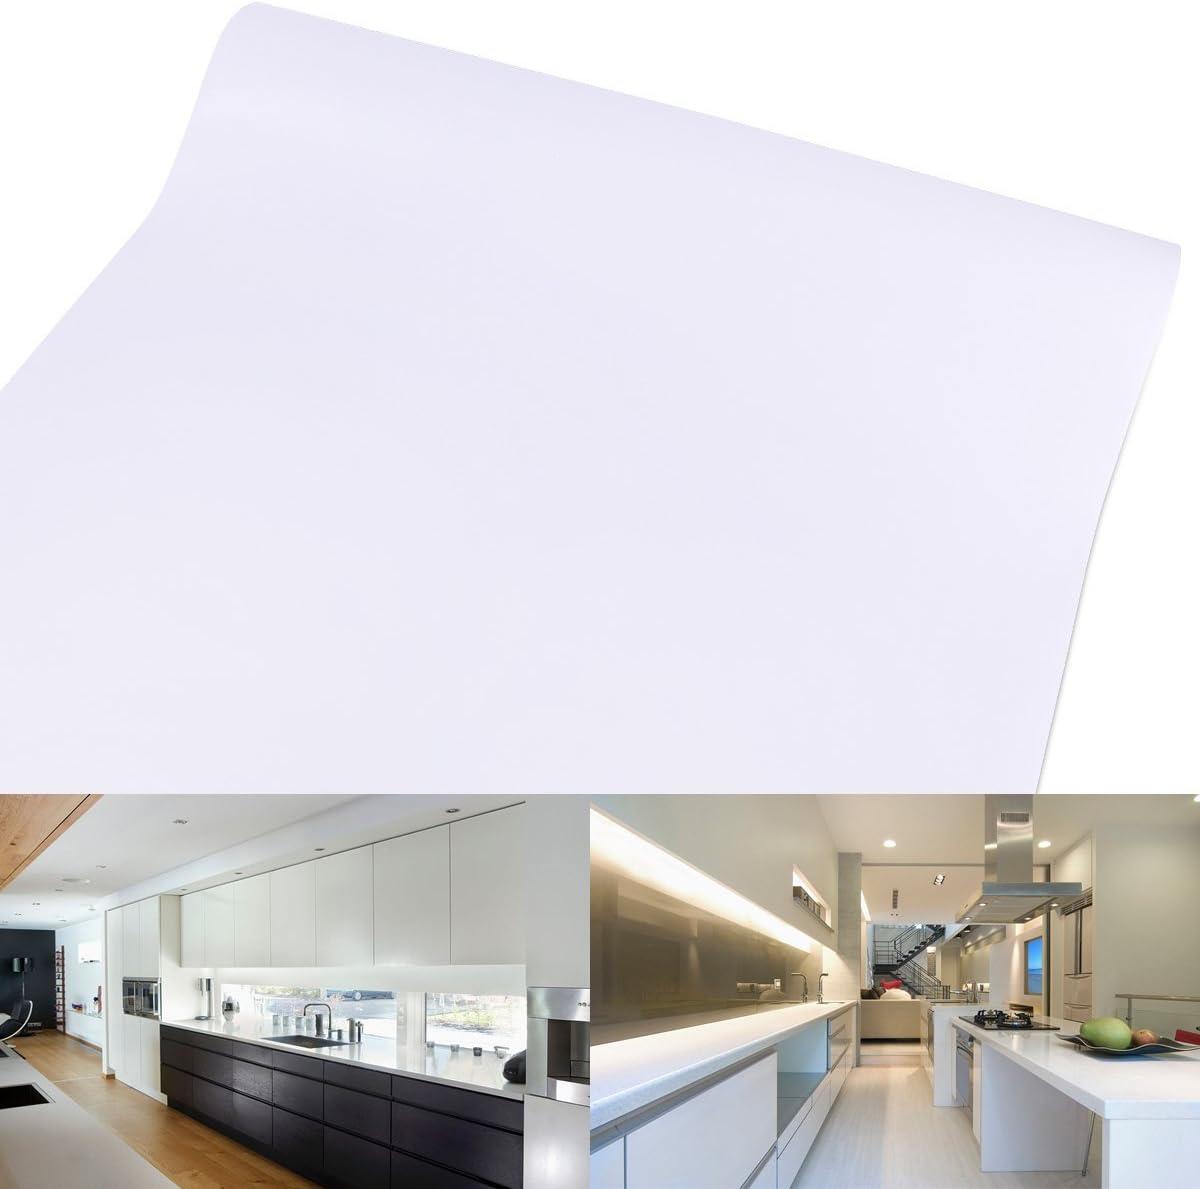 61 cm Rollo – 10 M (Metro) Blanco Autoadhesivo Muebles pantalla para manualidades pantalla pantalla para plotter Armario pantalla decorativo pantalla pantalla: Amazon.es: Hogar